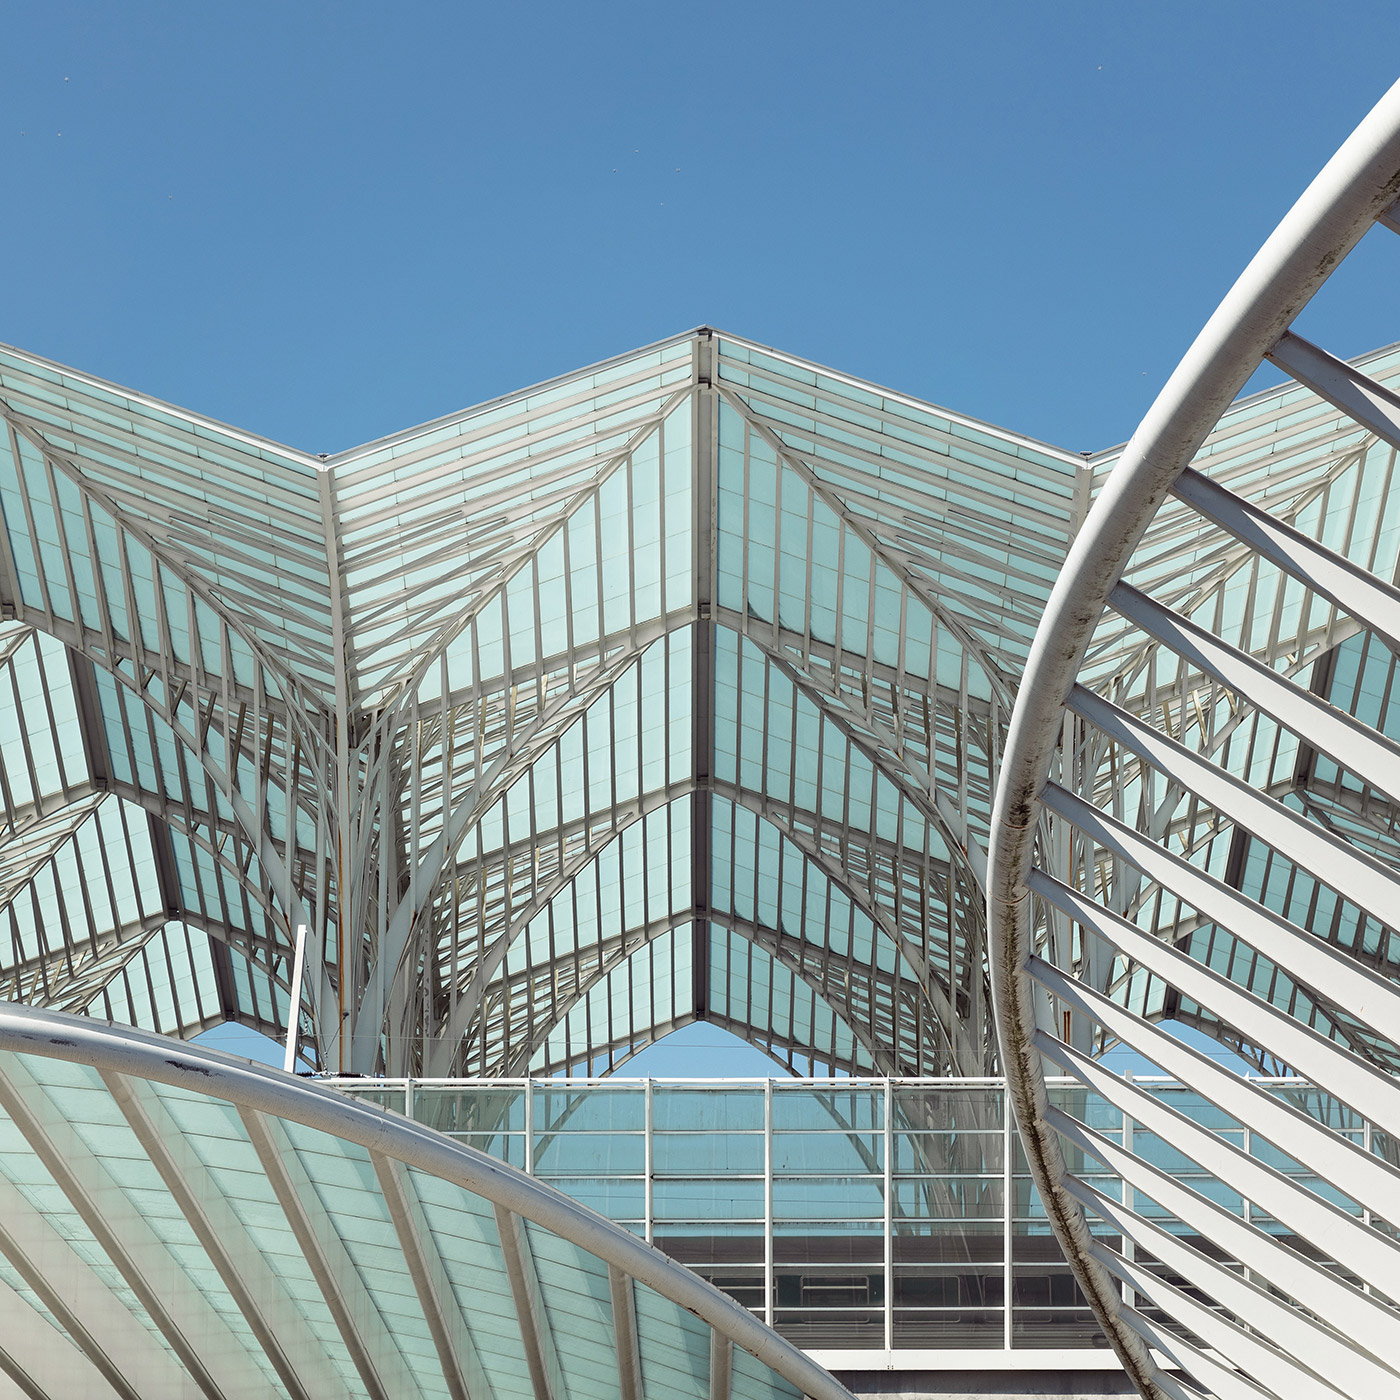 Gare do Oriente . Location: Lisbon, Portugal . Architect: Santiago Calatrava